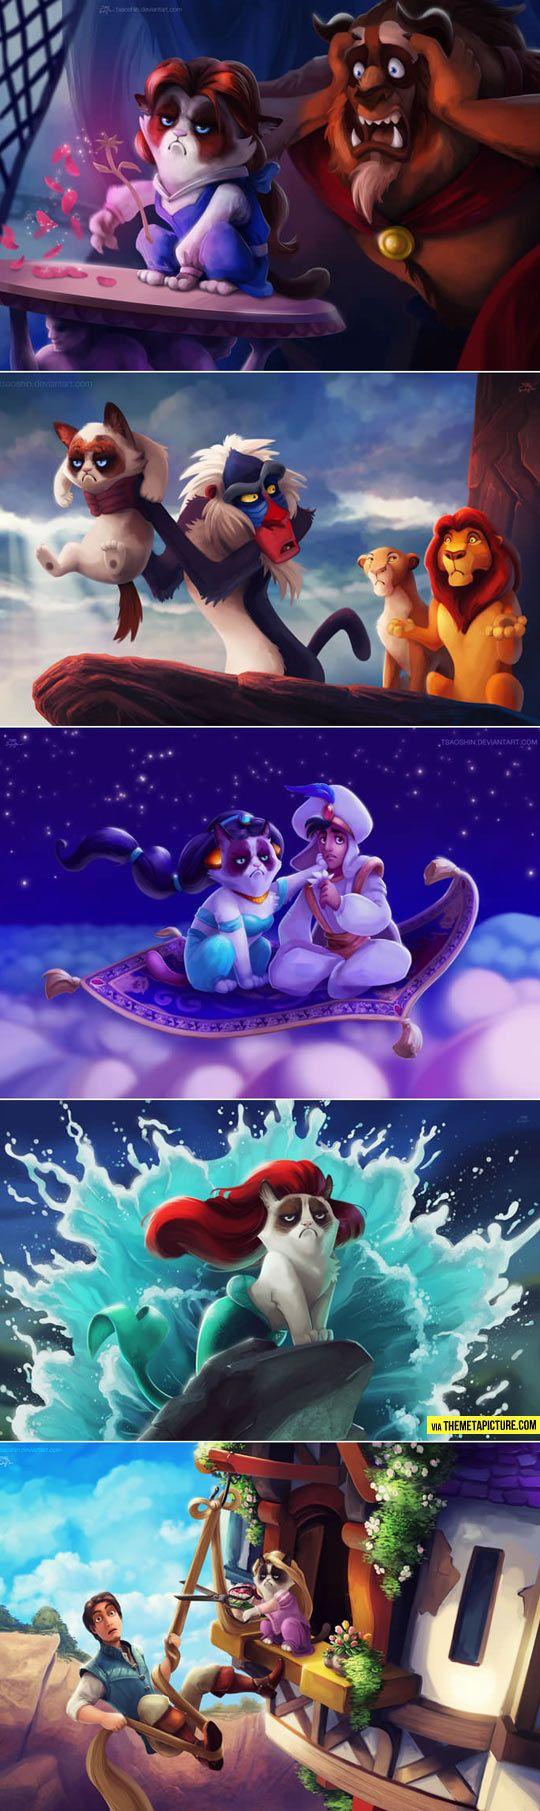 Disney movie photo gallery